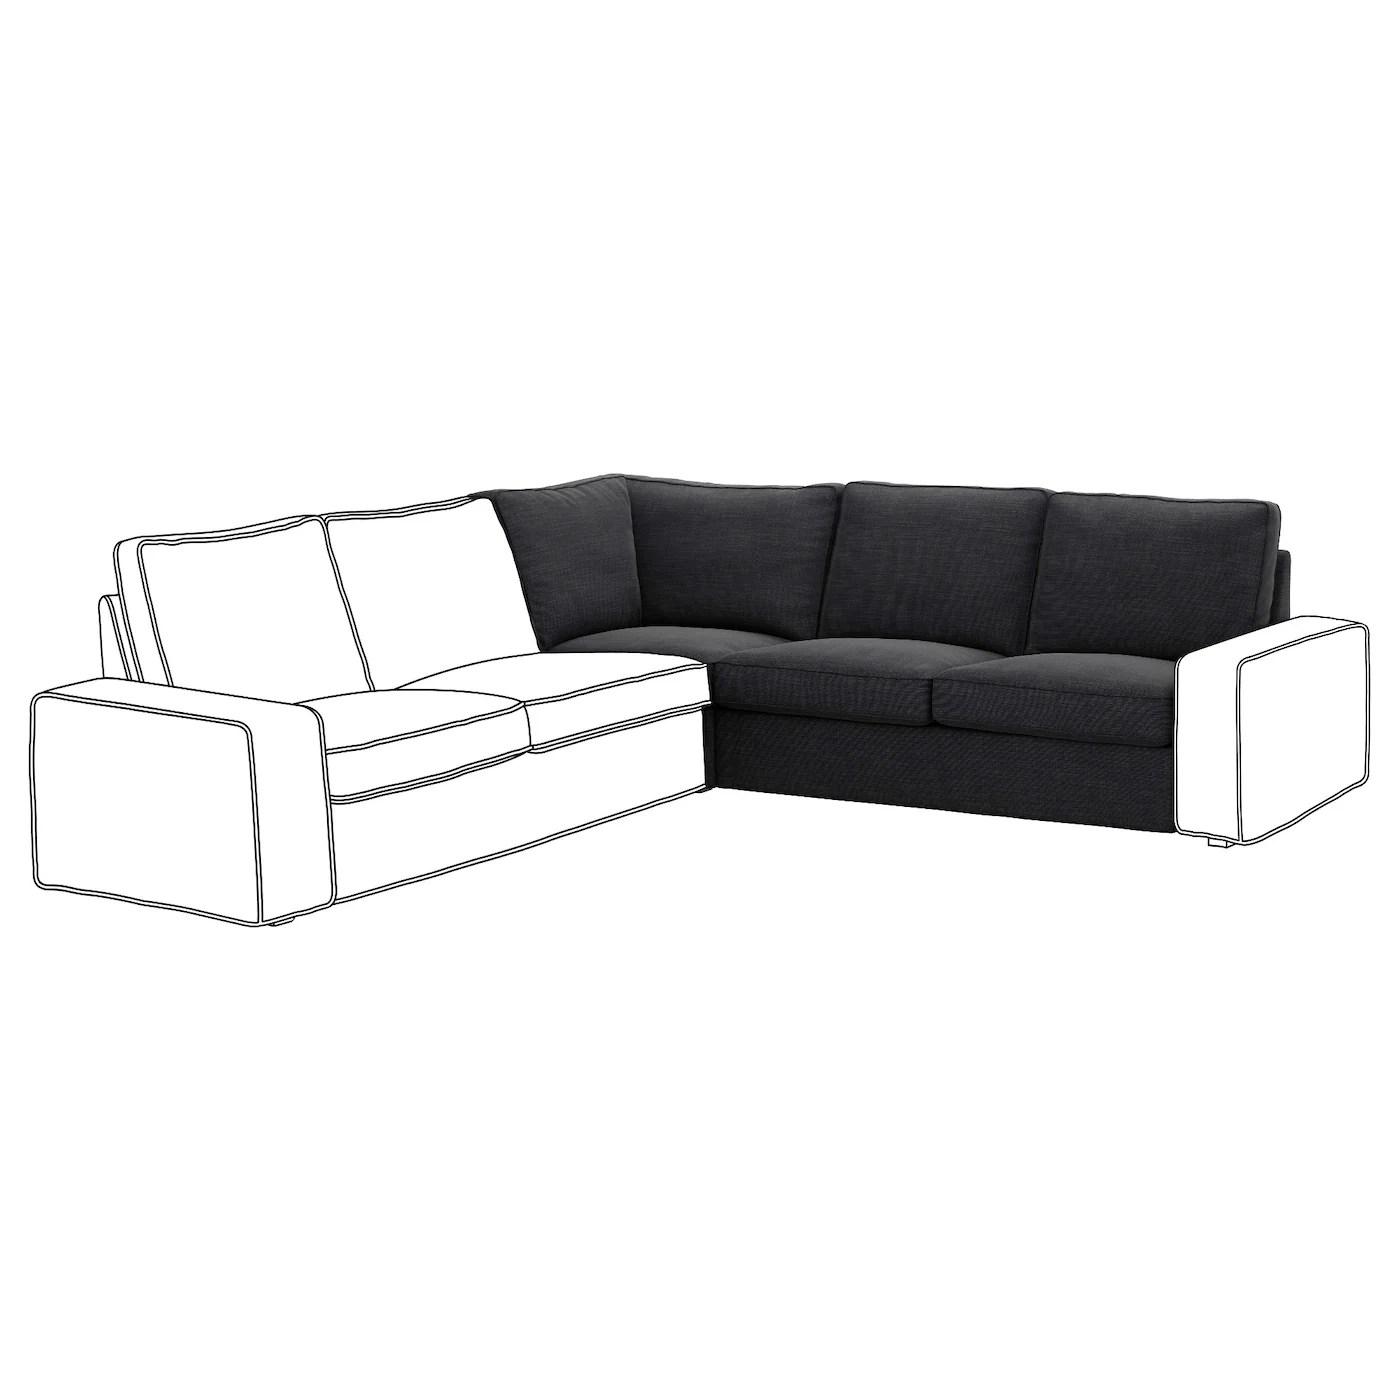 modular sofas ireland latex foam sofa bed and sectional ikea